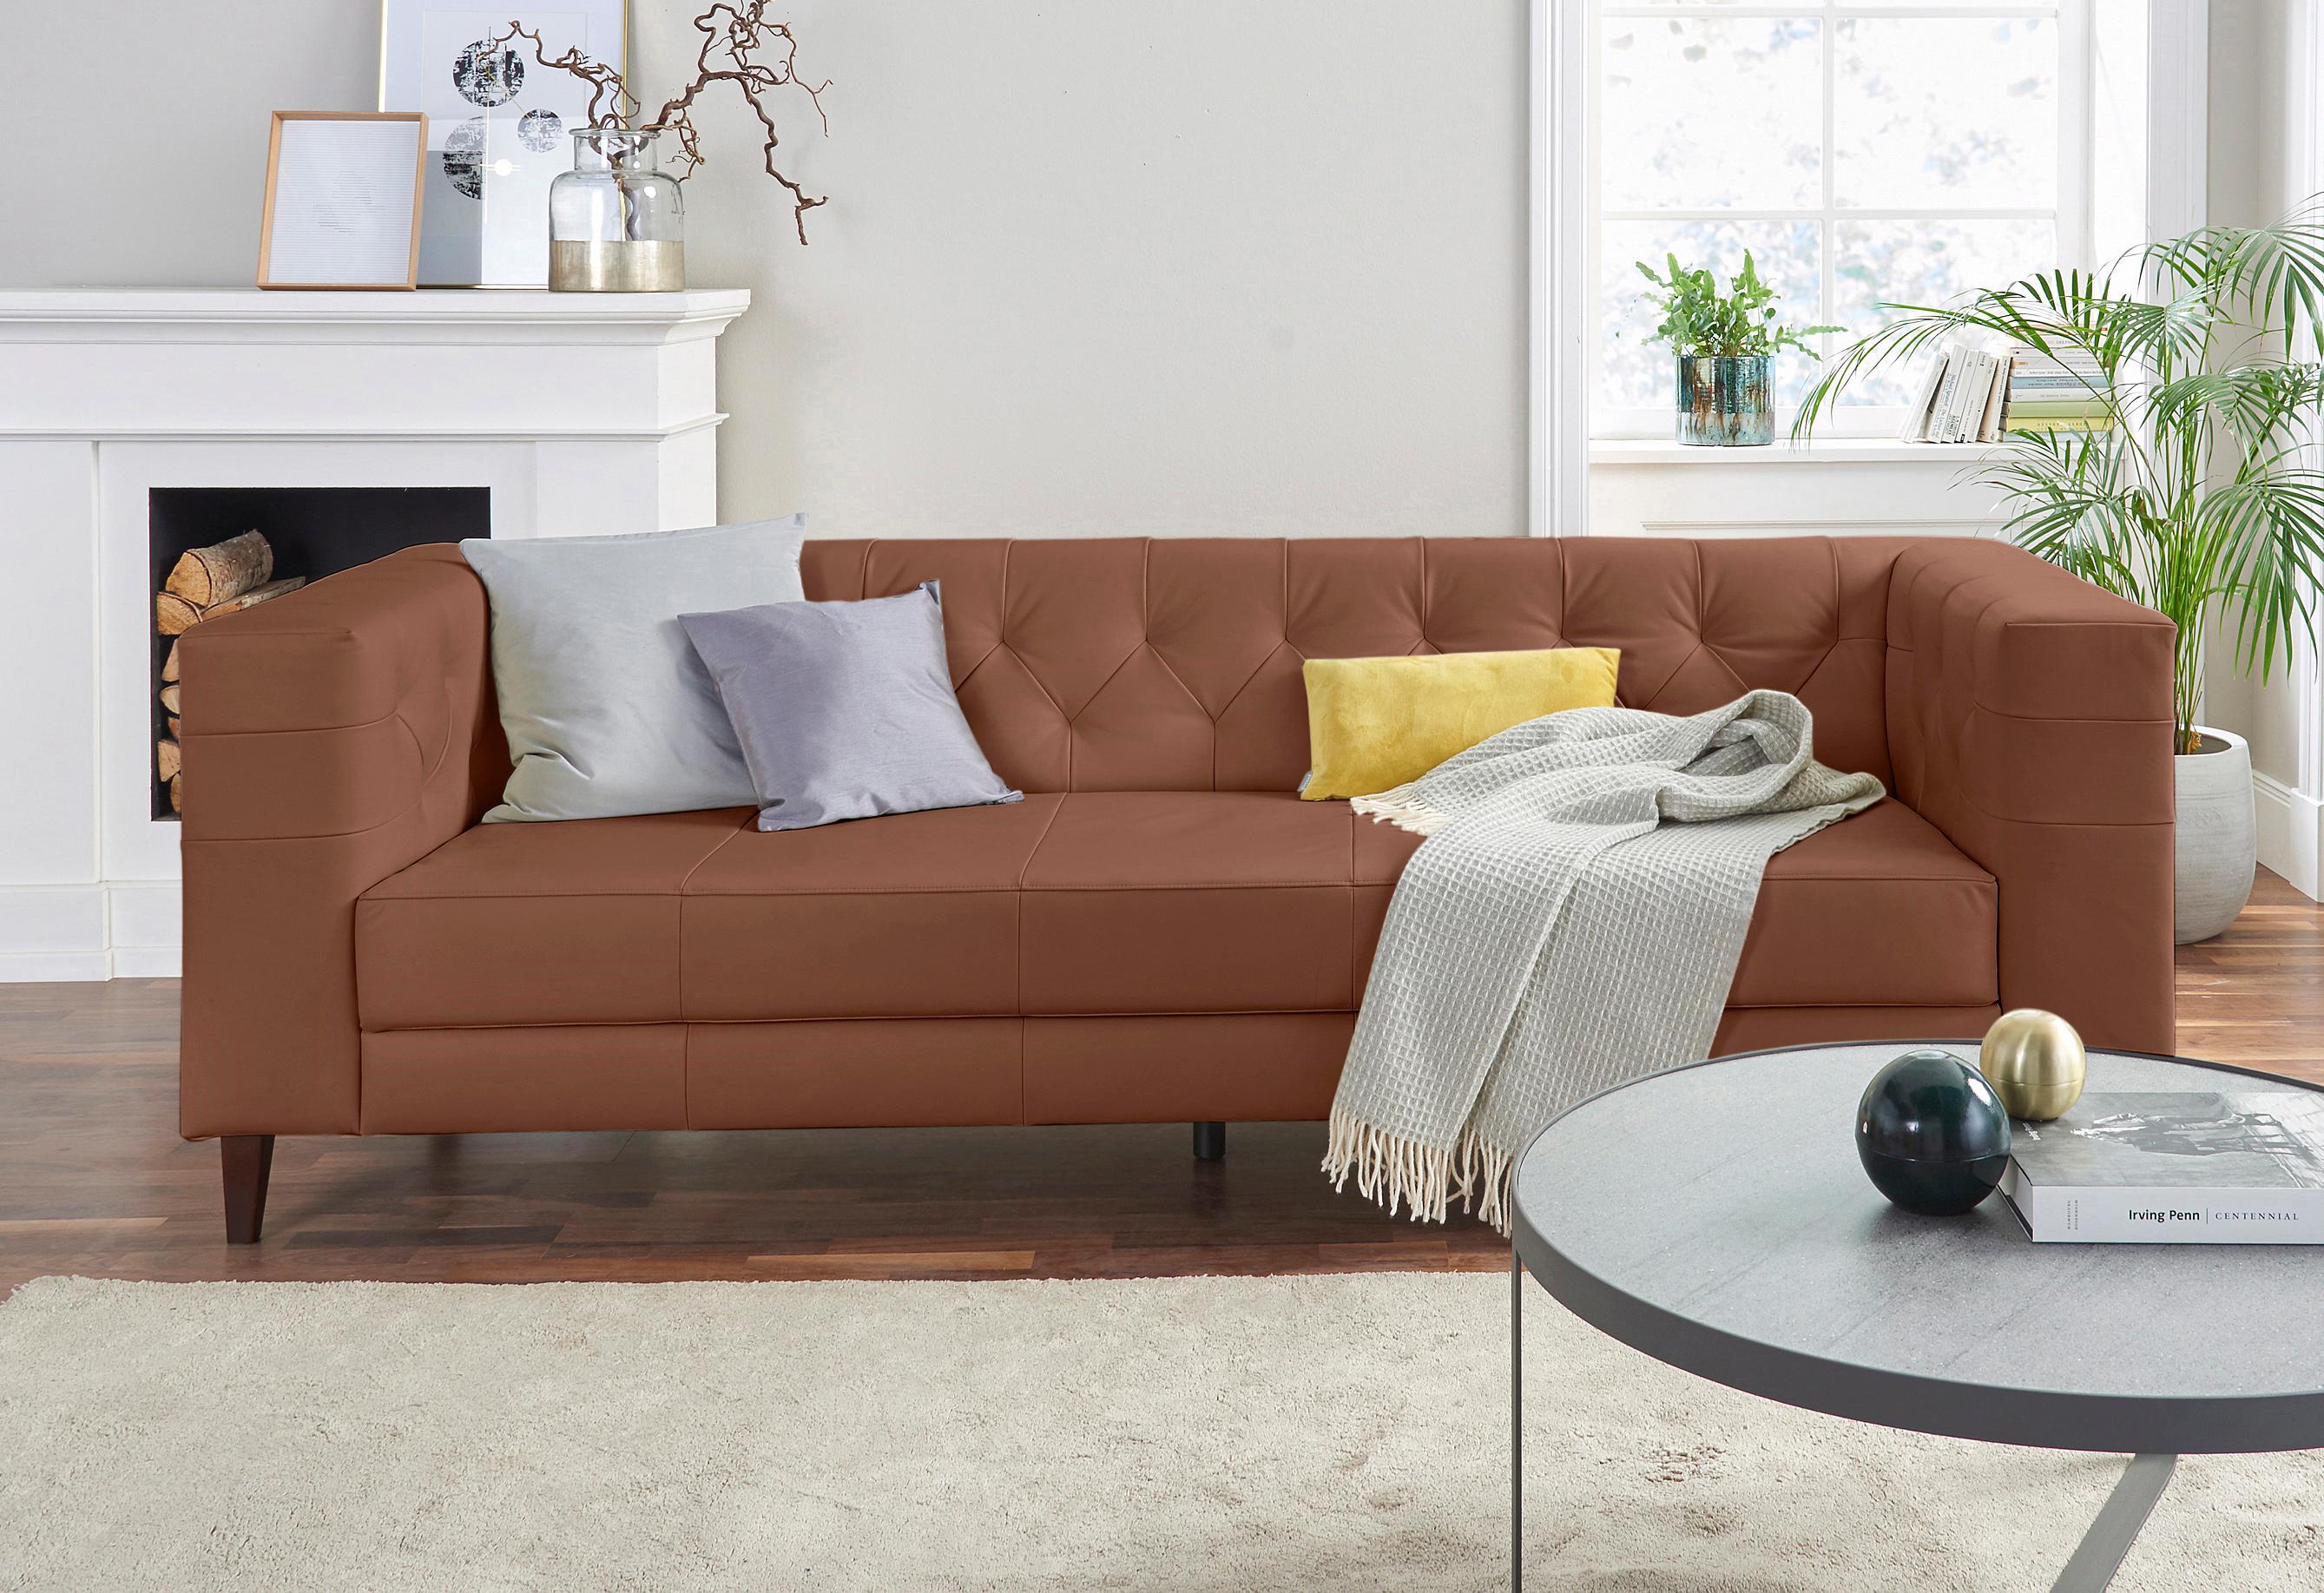 66b8bdaf3a9d8f Möbel online günstig kaufen über shop24.at